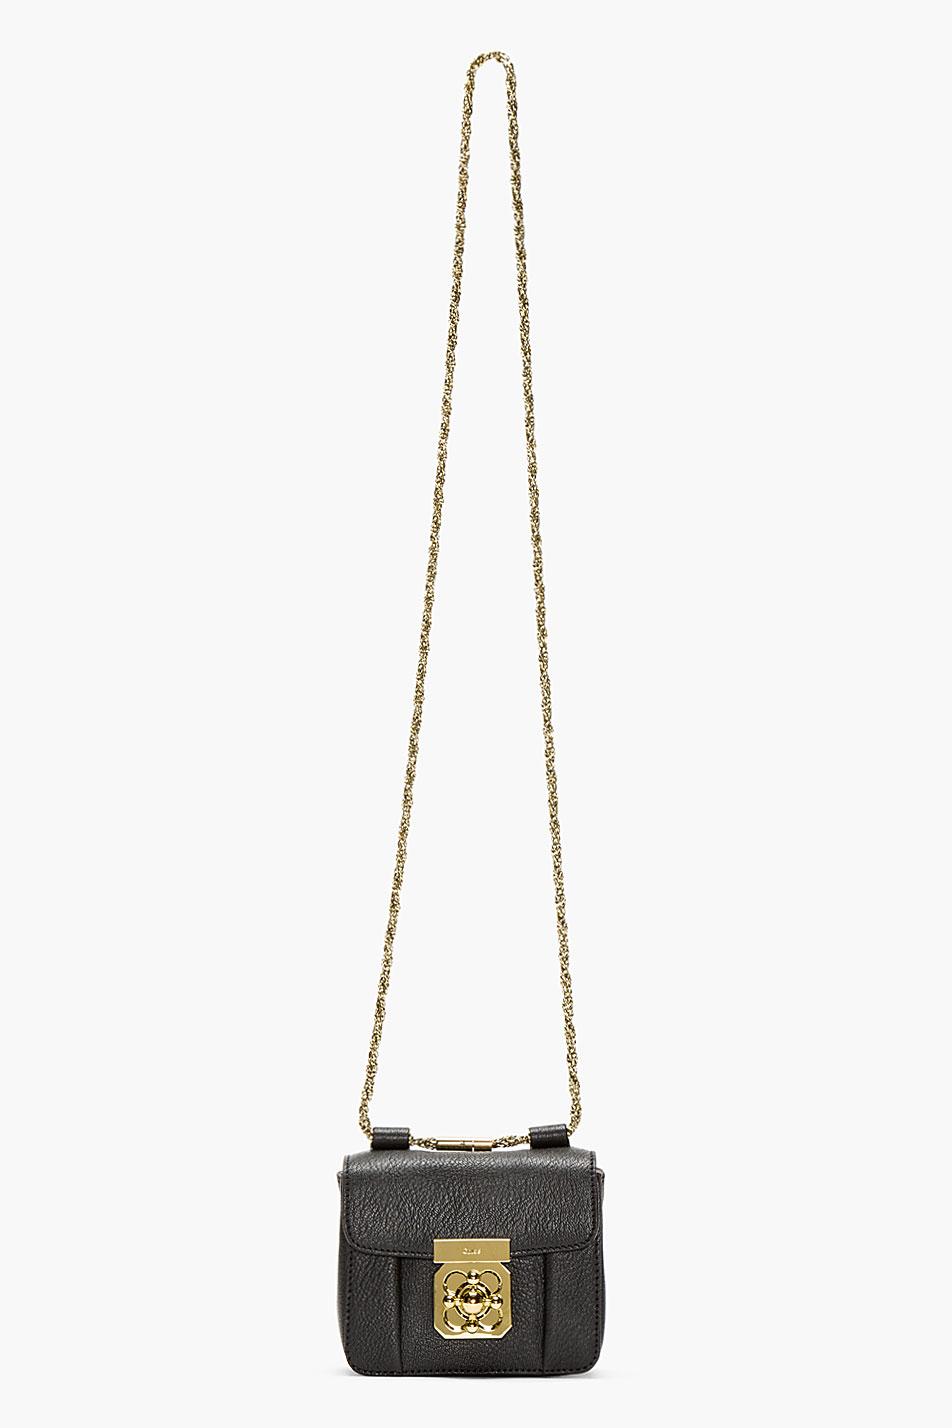 Chlo¨¦ Black Grained Leather Mini Elsie Bag in Gray (black) | Lyst